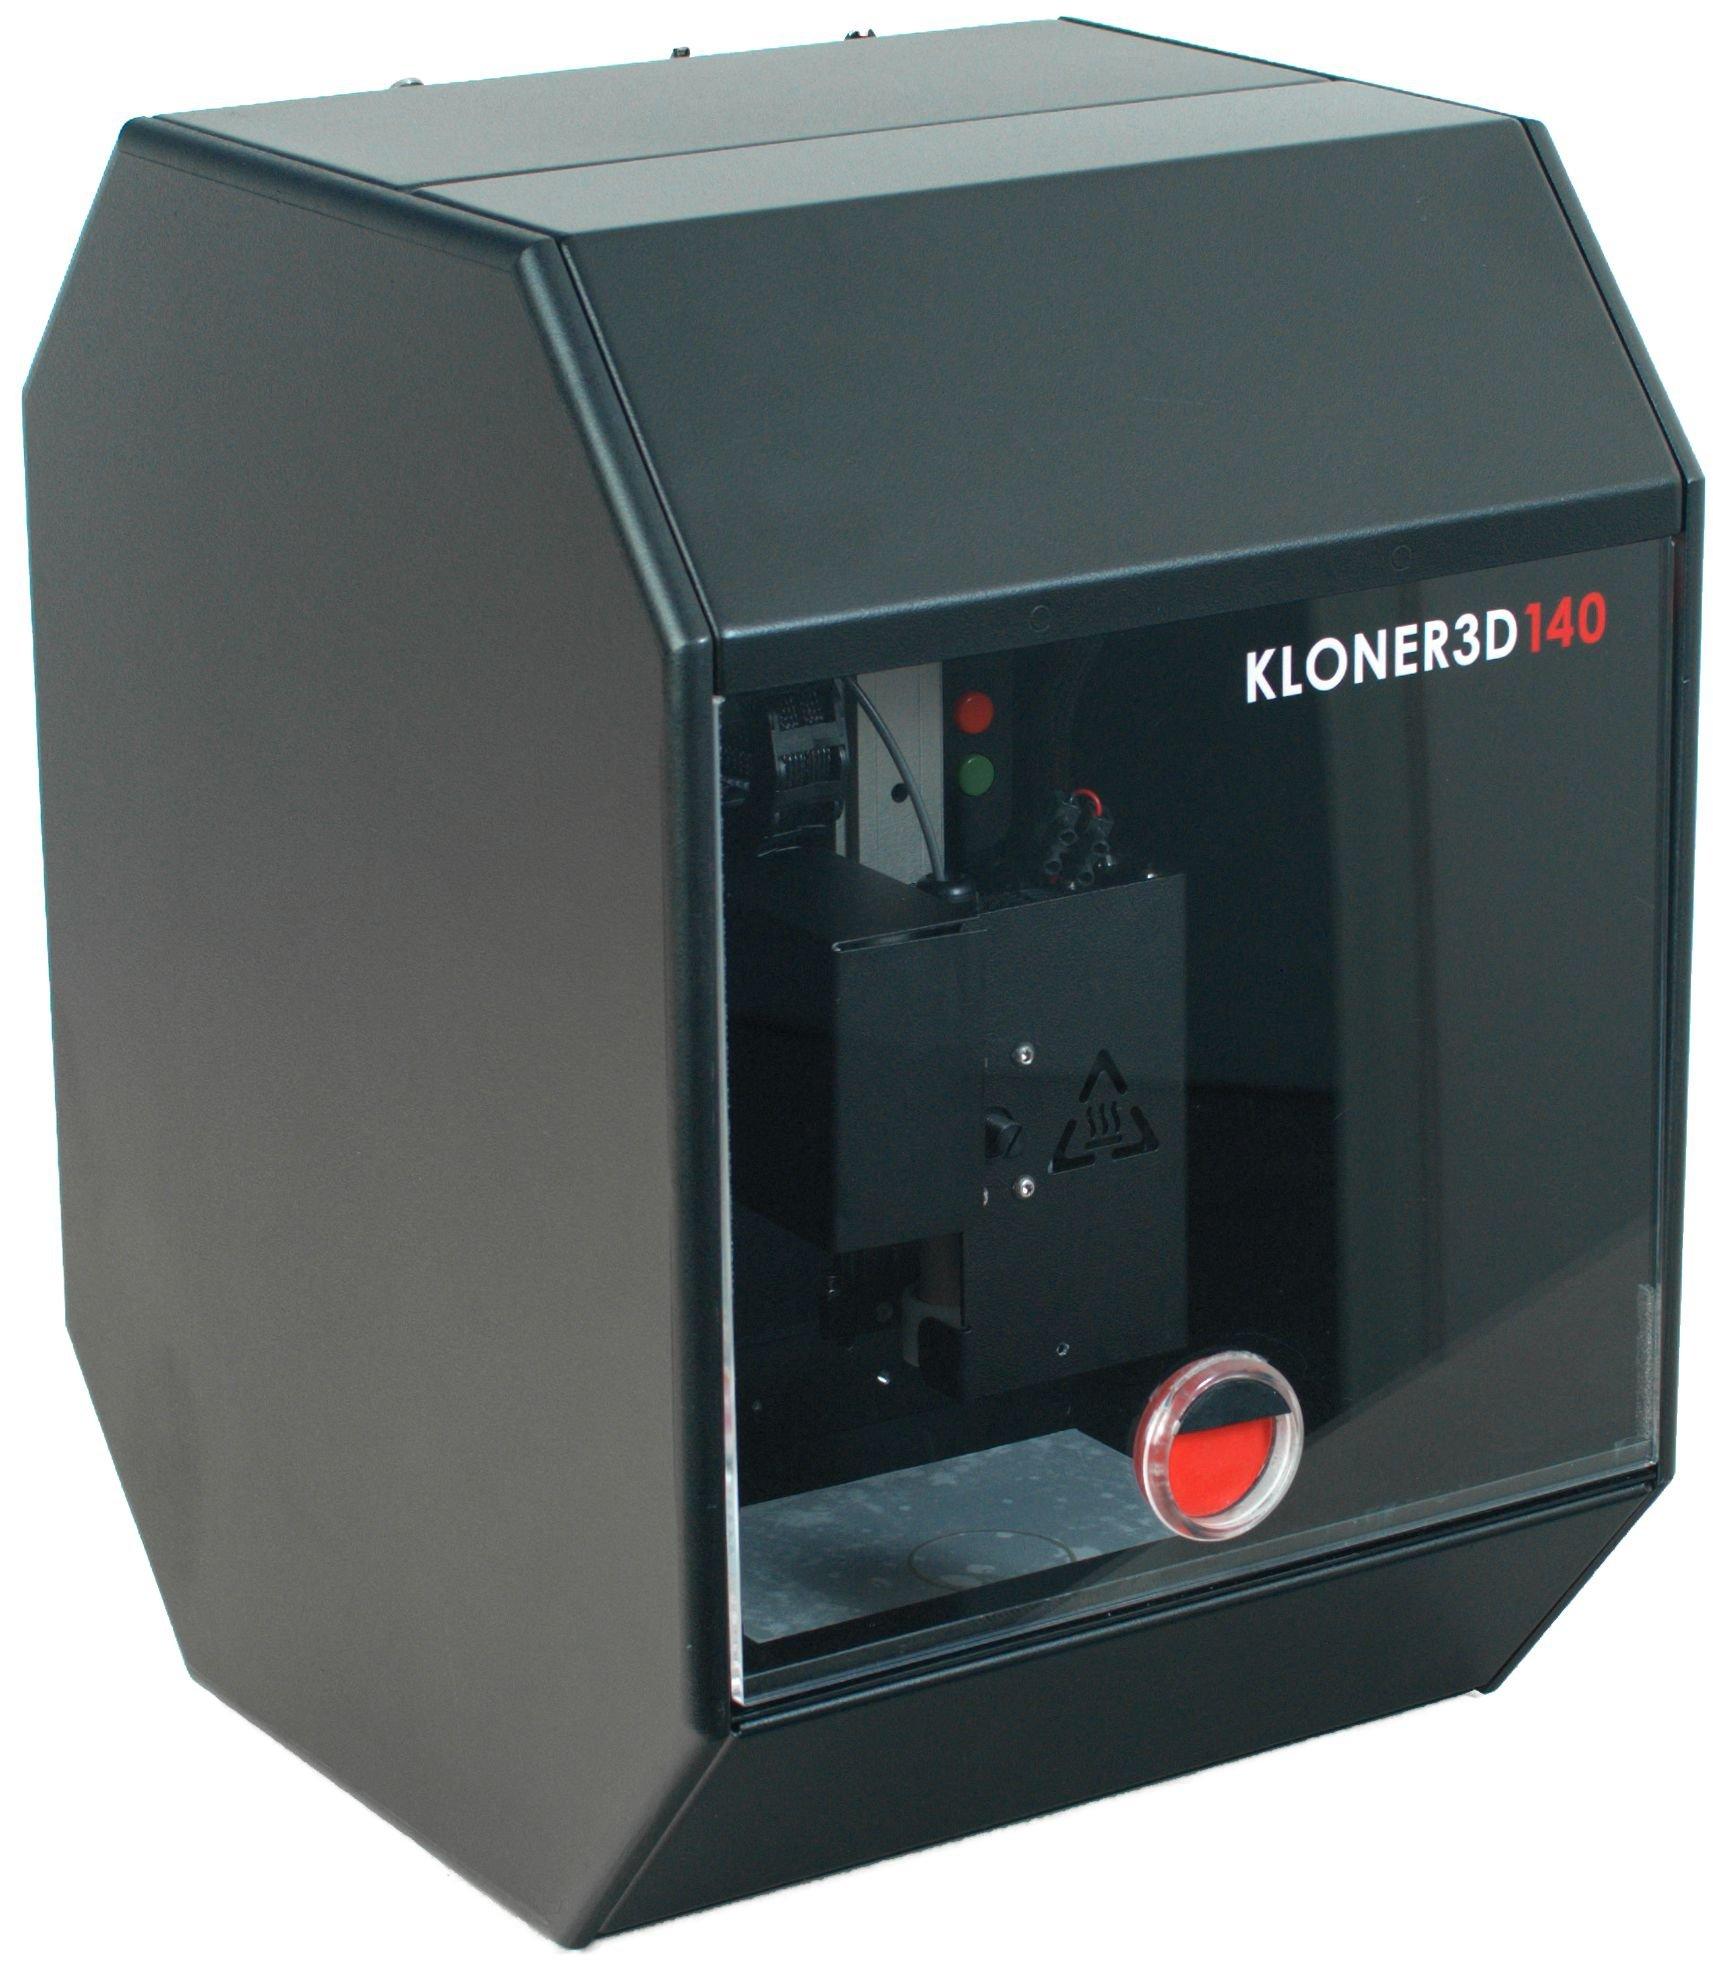 Kloner3D 140 Impresora 3D, Desktop Series